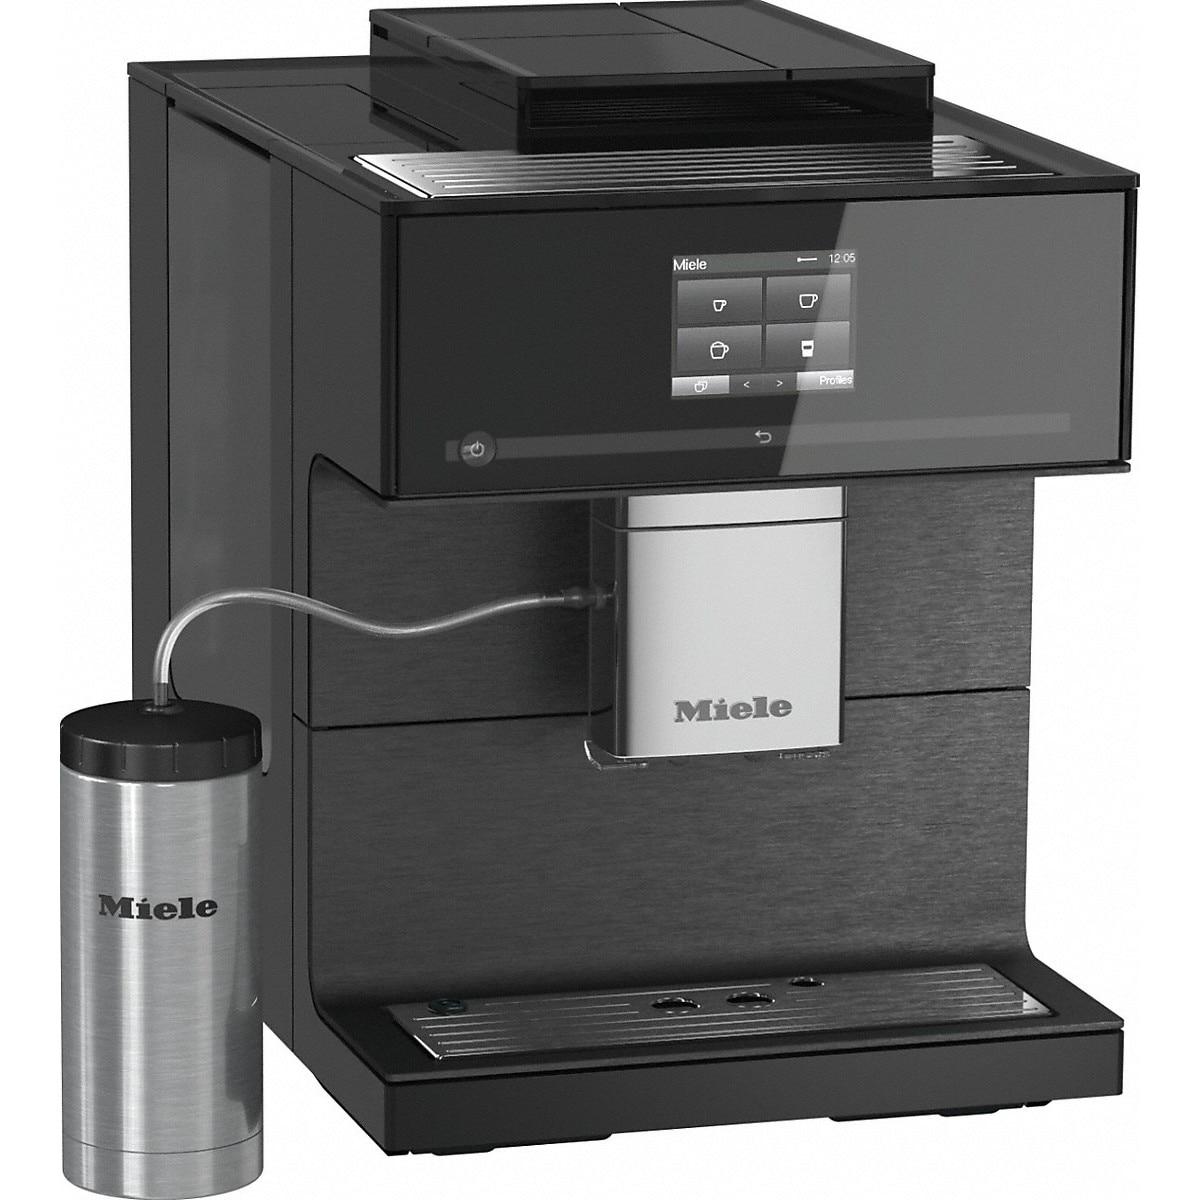 Fotografie Espressor automat Miele CM 7750, One Touch for Two, Aromatic SystemFresh, AutoDescale, WLAN, 2.2 l, 3 recipiente cafea, Negru